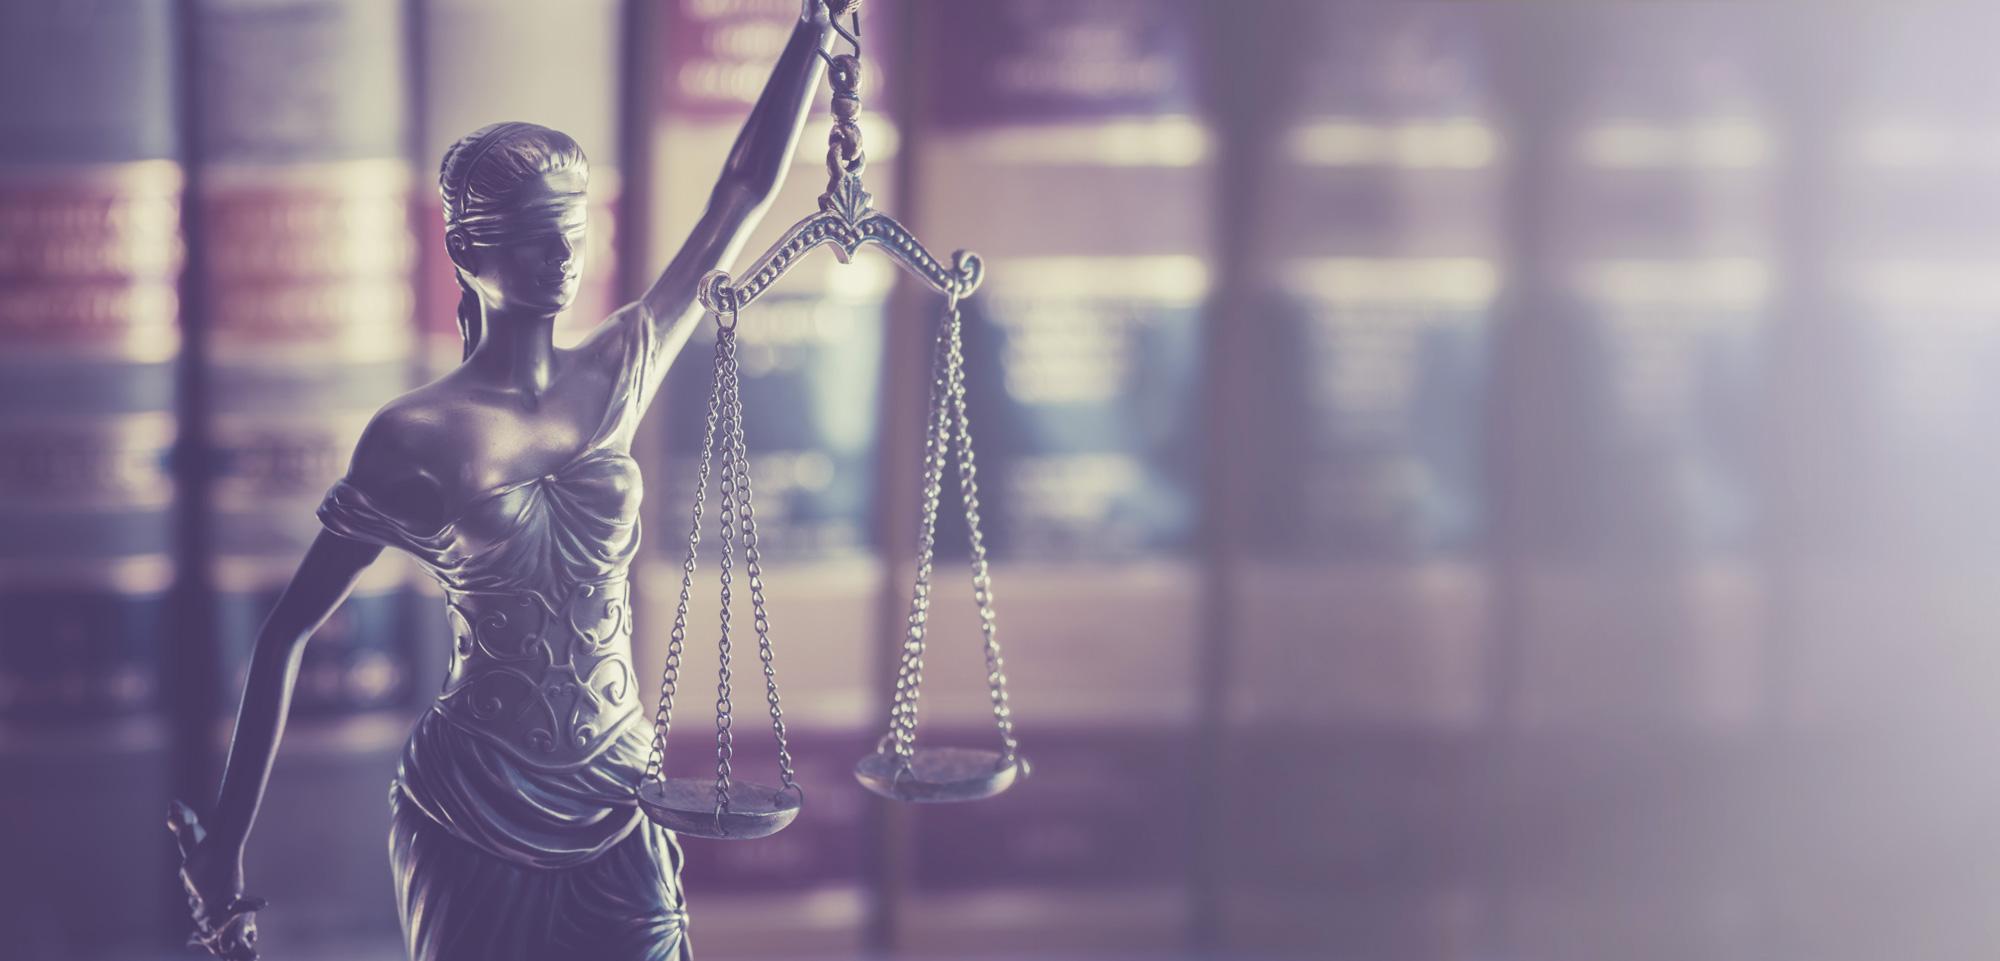 Legal-law-concept-image-681164016_8328x4000.jpg